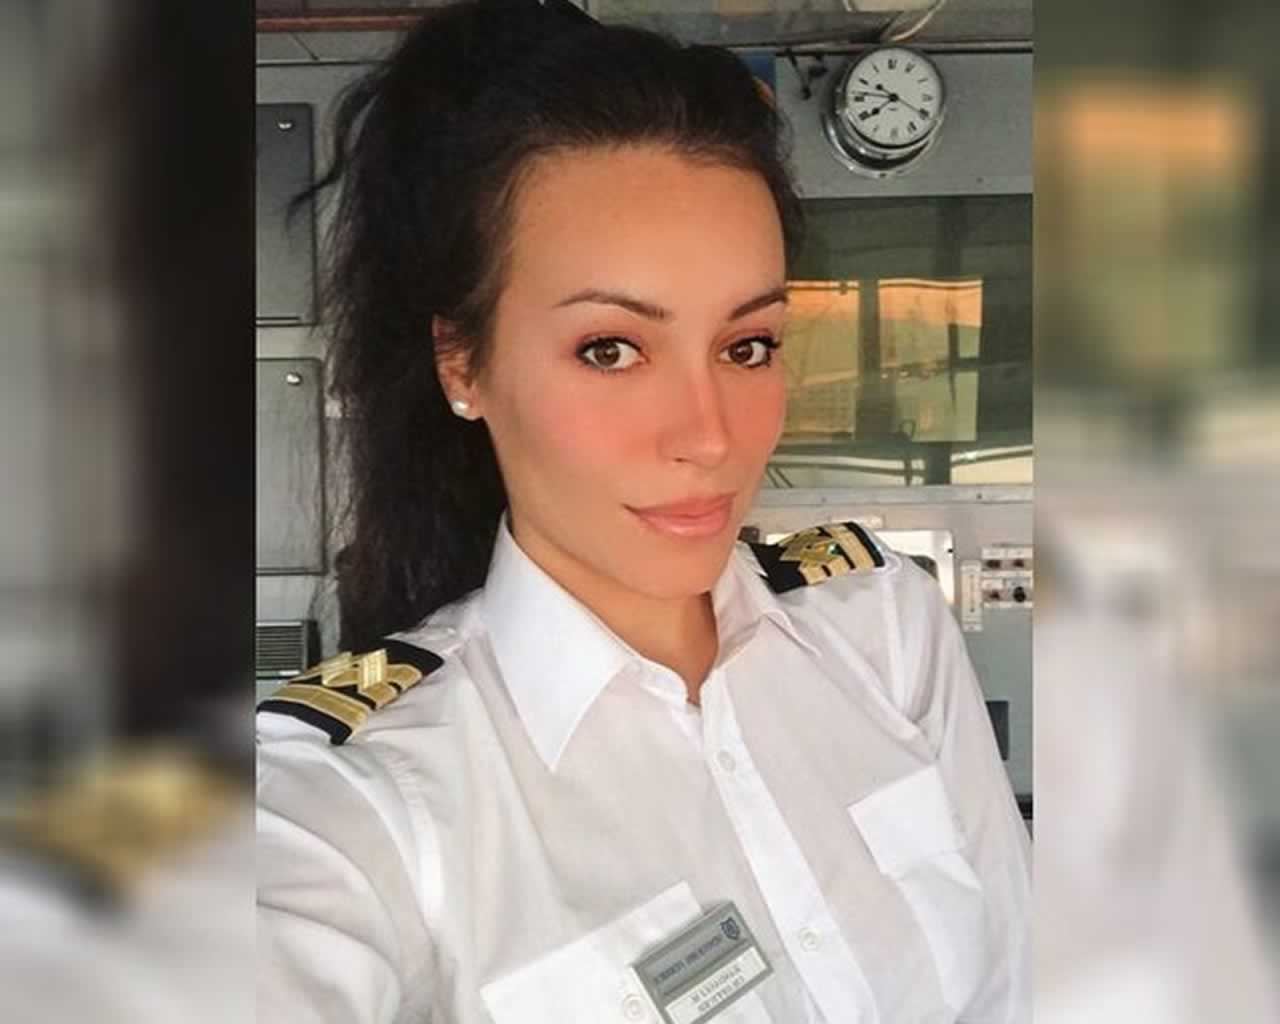 Survivor spoiler: Ποια είναι η νέα καπετάνισσα Μαριάνθη Καλατζάκη- Κασδαγλή